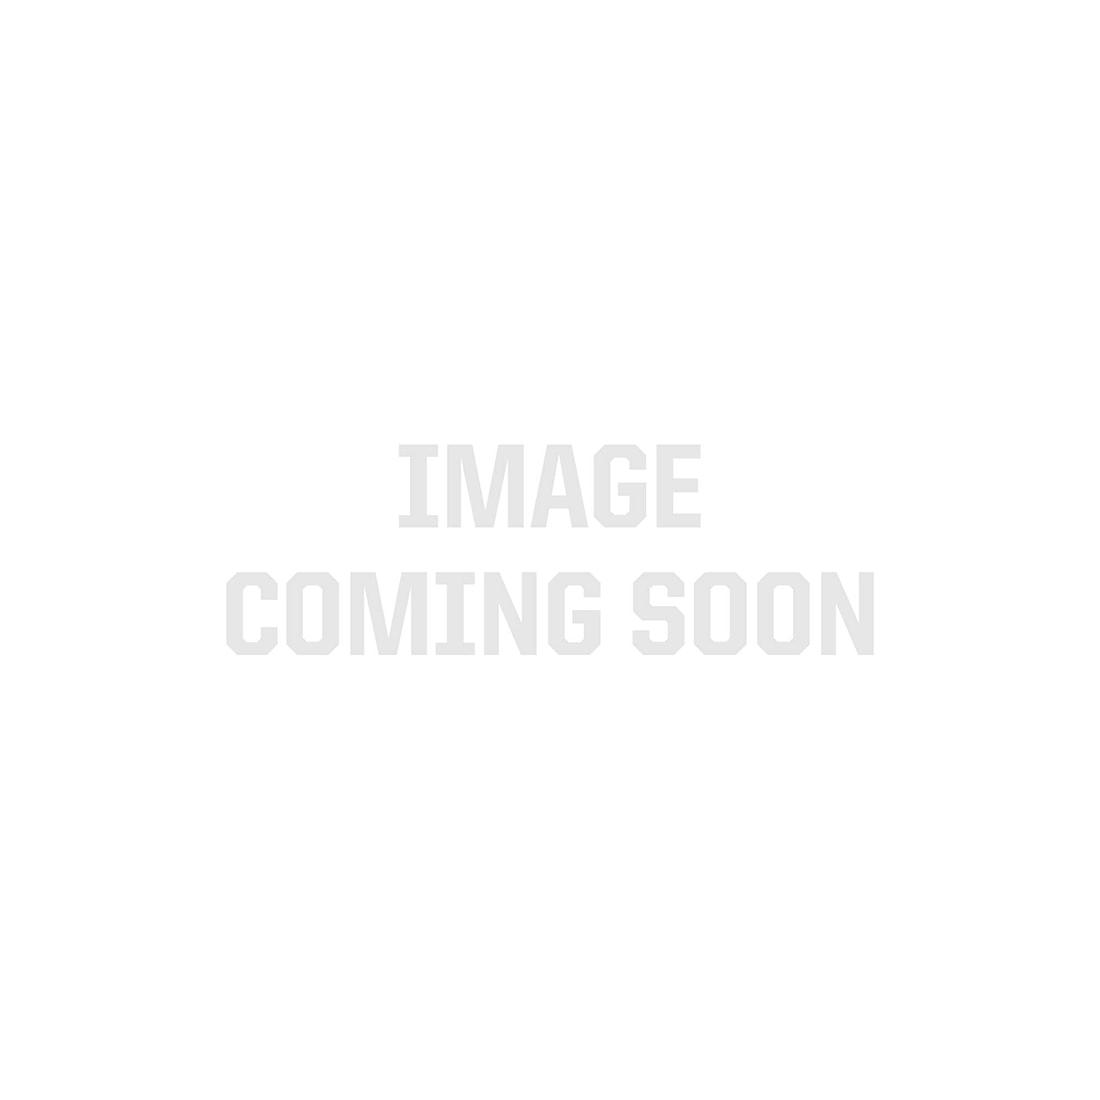 Waterproof Soft White 2835 Single Row CurrentControl LED Strip Light, 60/m, 10mm wide, Sample Kit